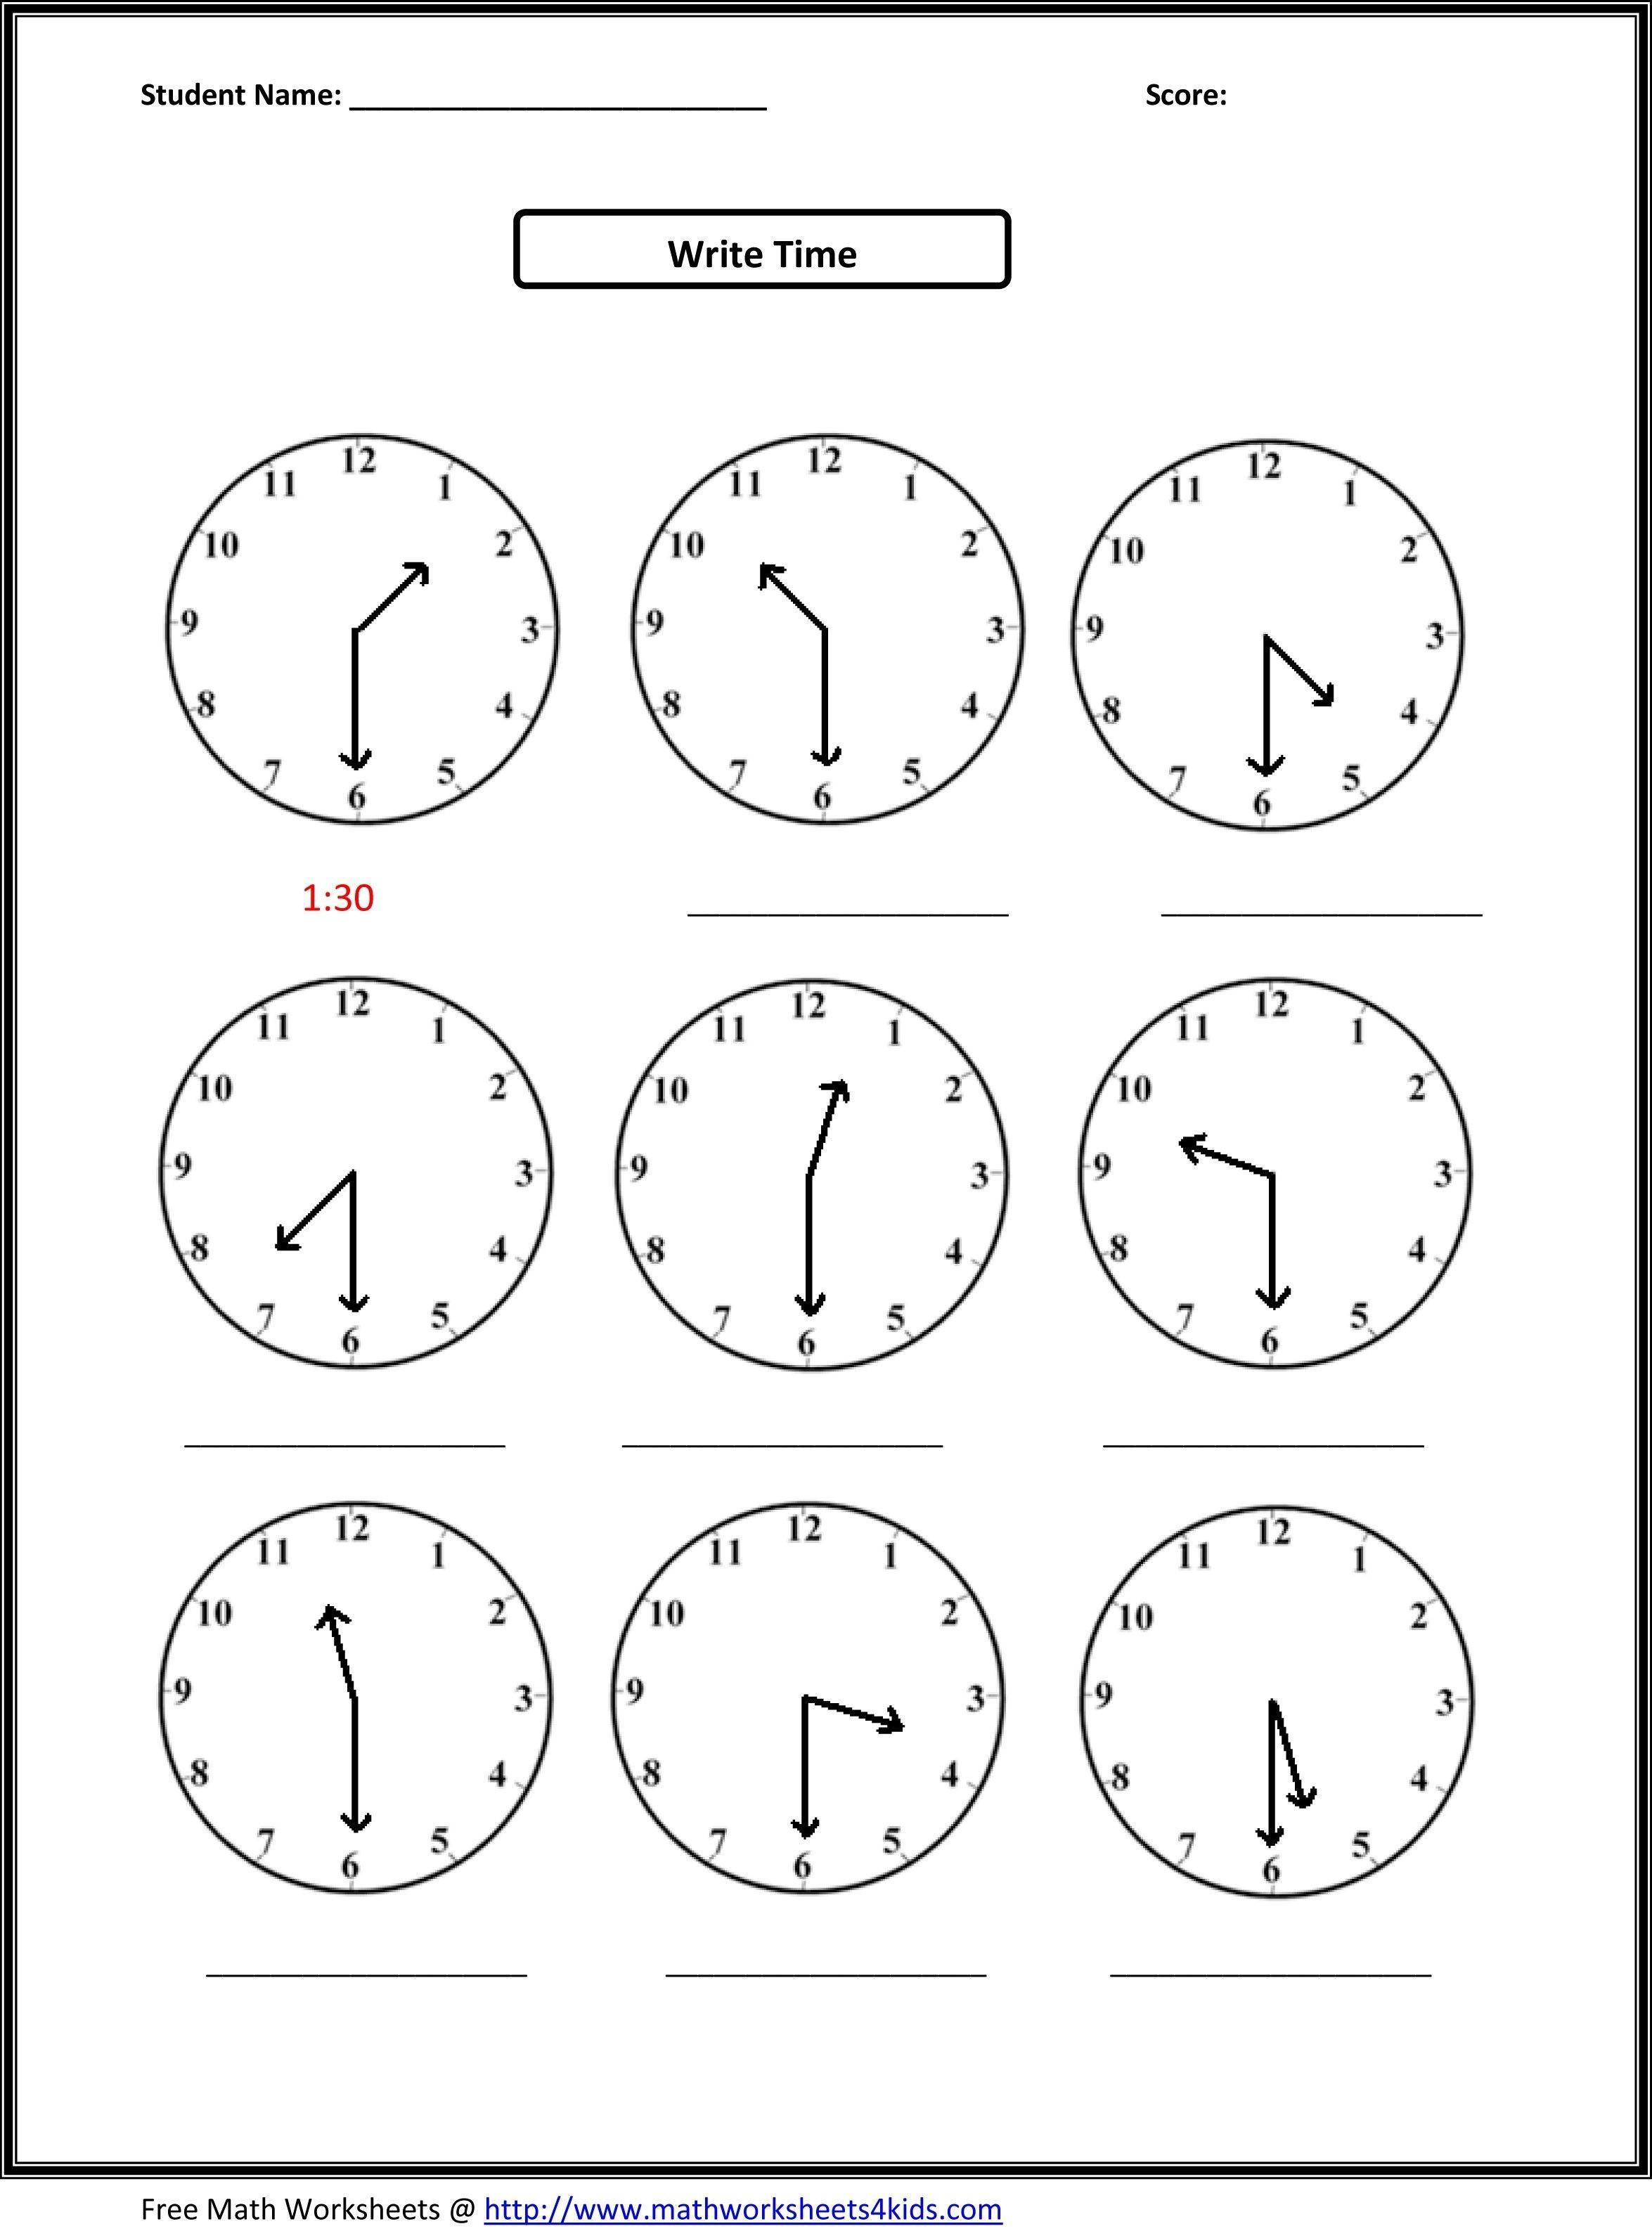 Telling Time Worksheets Ks3 New Clock Grade 3 Free Maths Printables   Printable Time Worksheets Grade 3